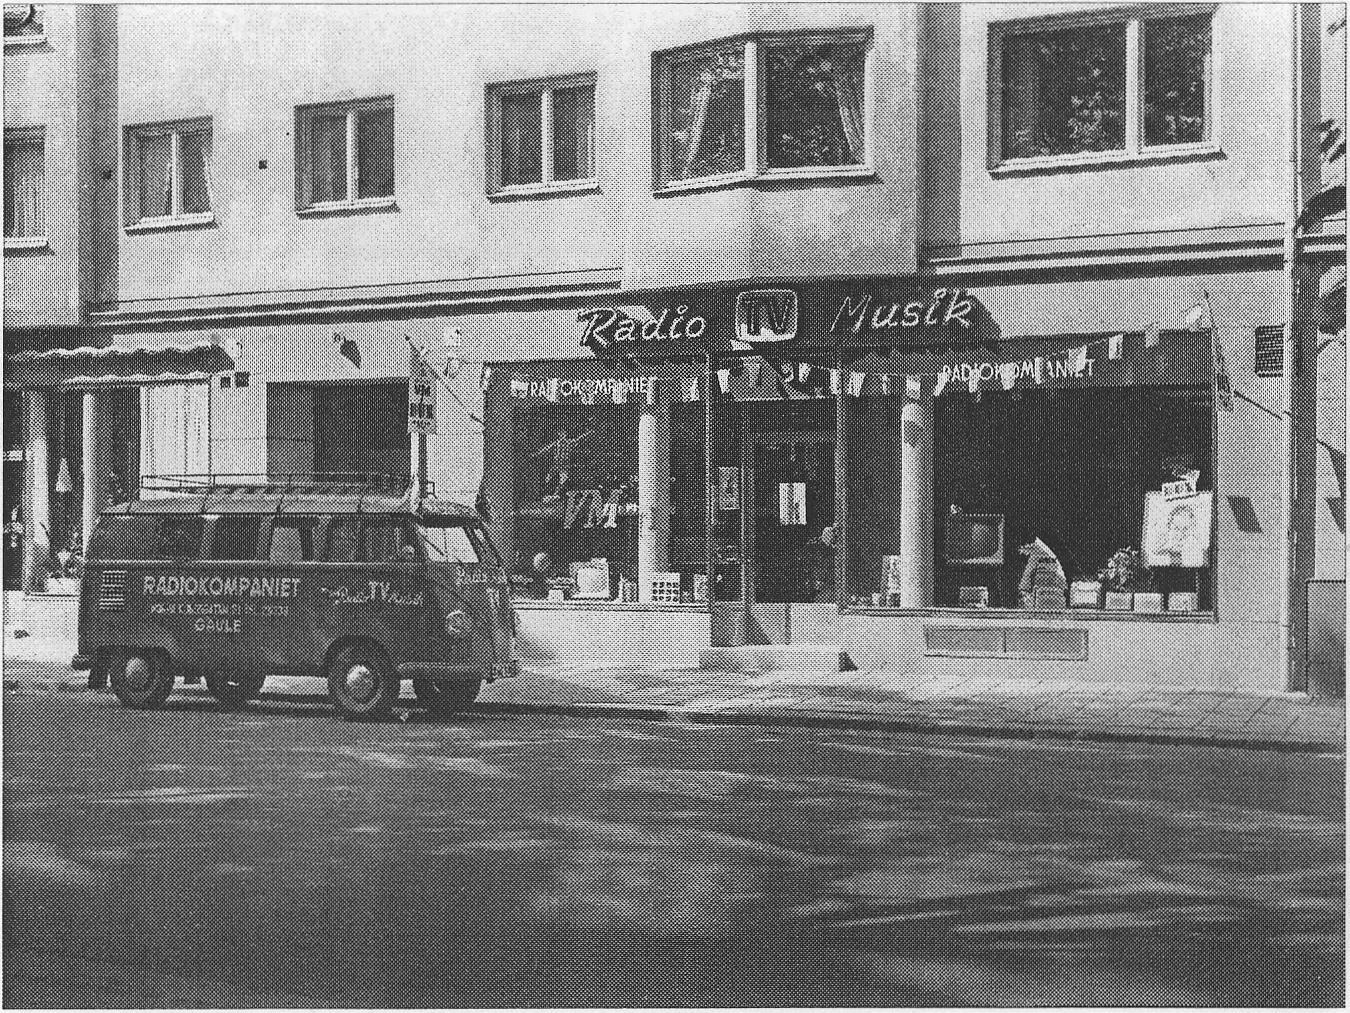 Radiokompaniet, Norra Kungsgatan 21, Gävle, sommaren 1958